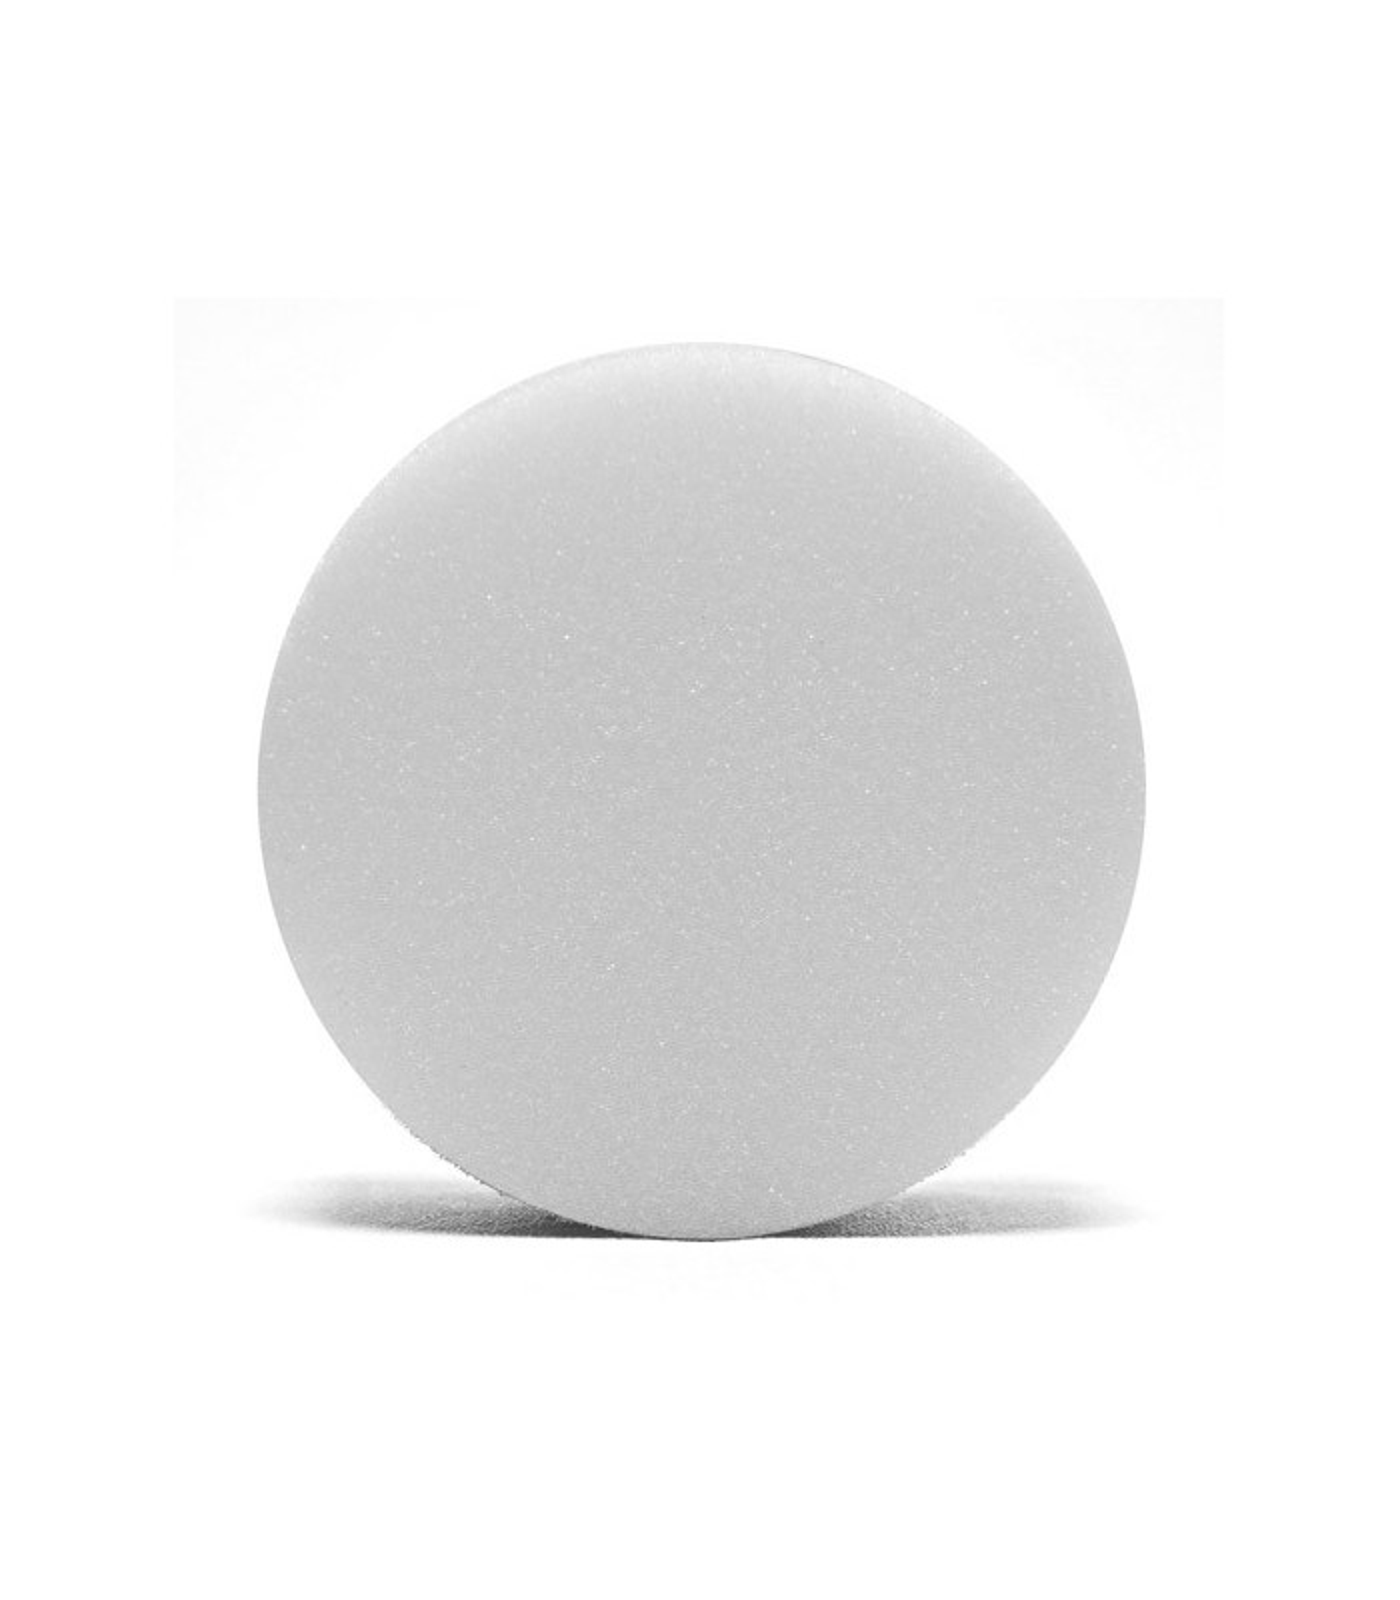 Lake Country 4 Inch Flat White Polishing pad - burete polish